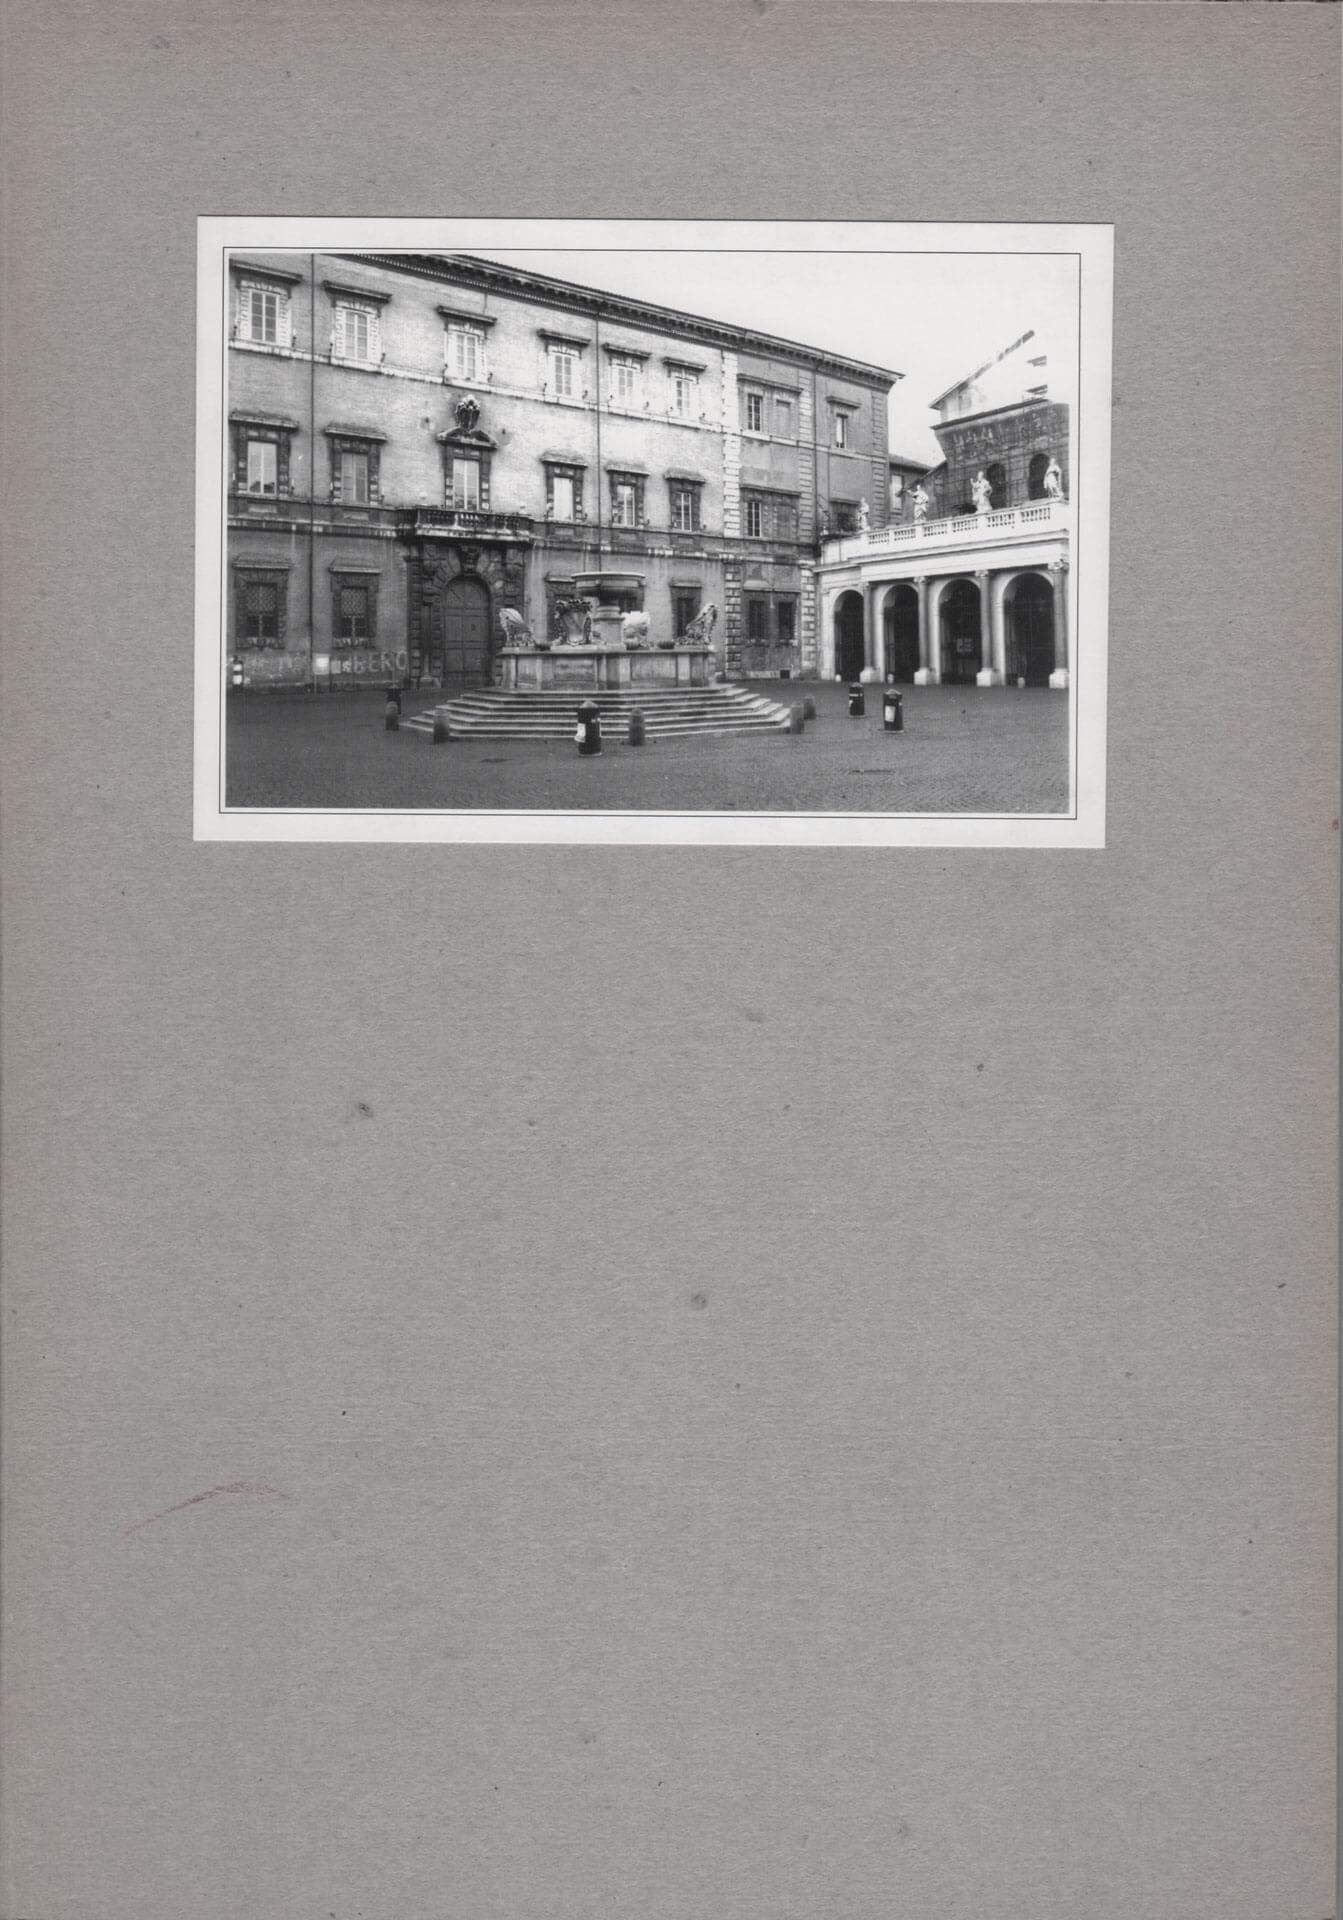 Studio Stefania Miscetti | Catalogues | Yoko Ono | Projected artists - Obiettivo: Roma III/V | Venetian Man